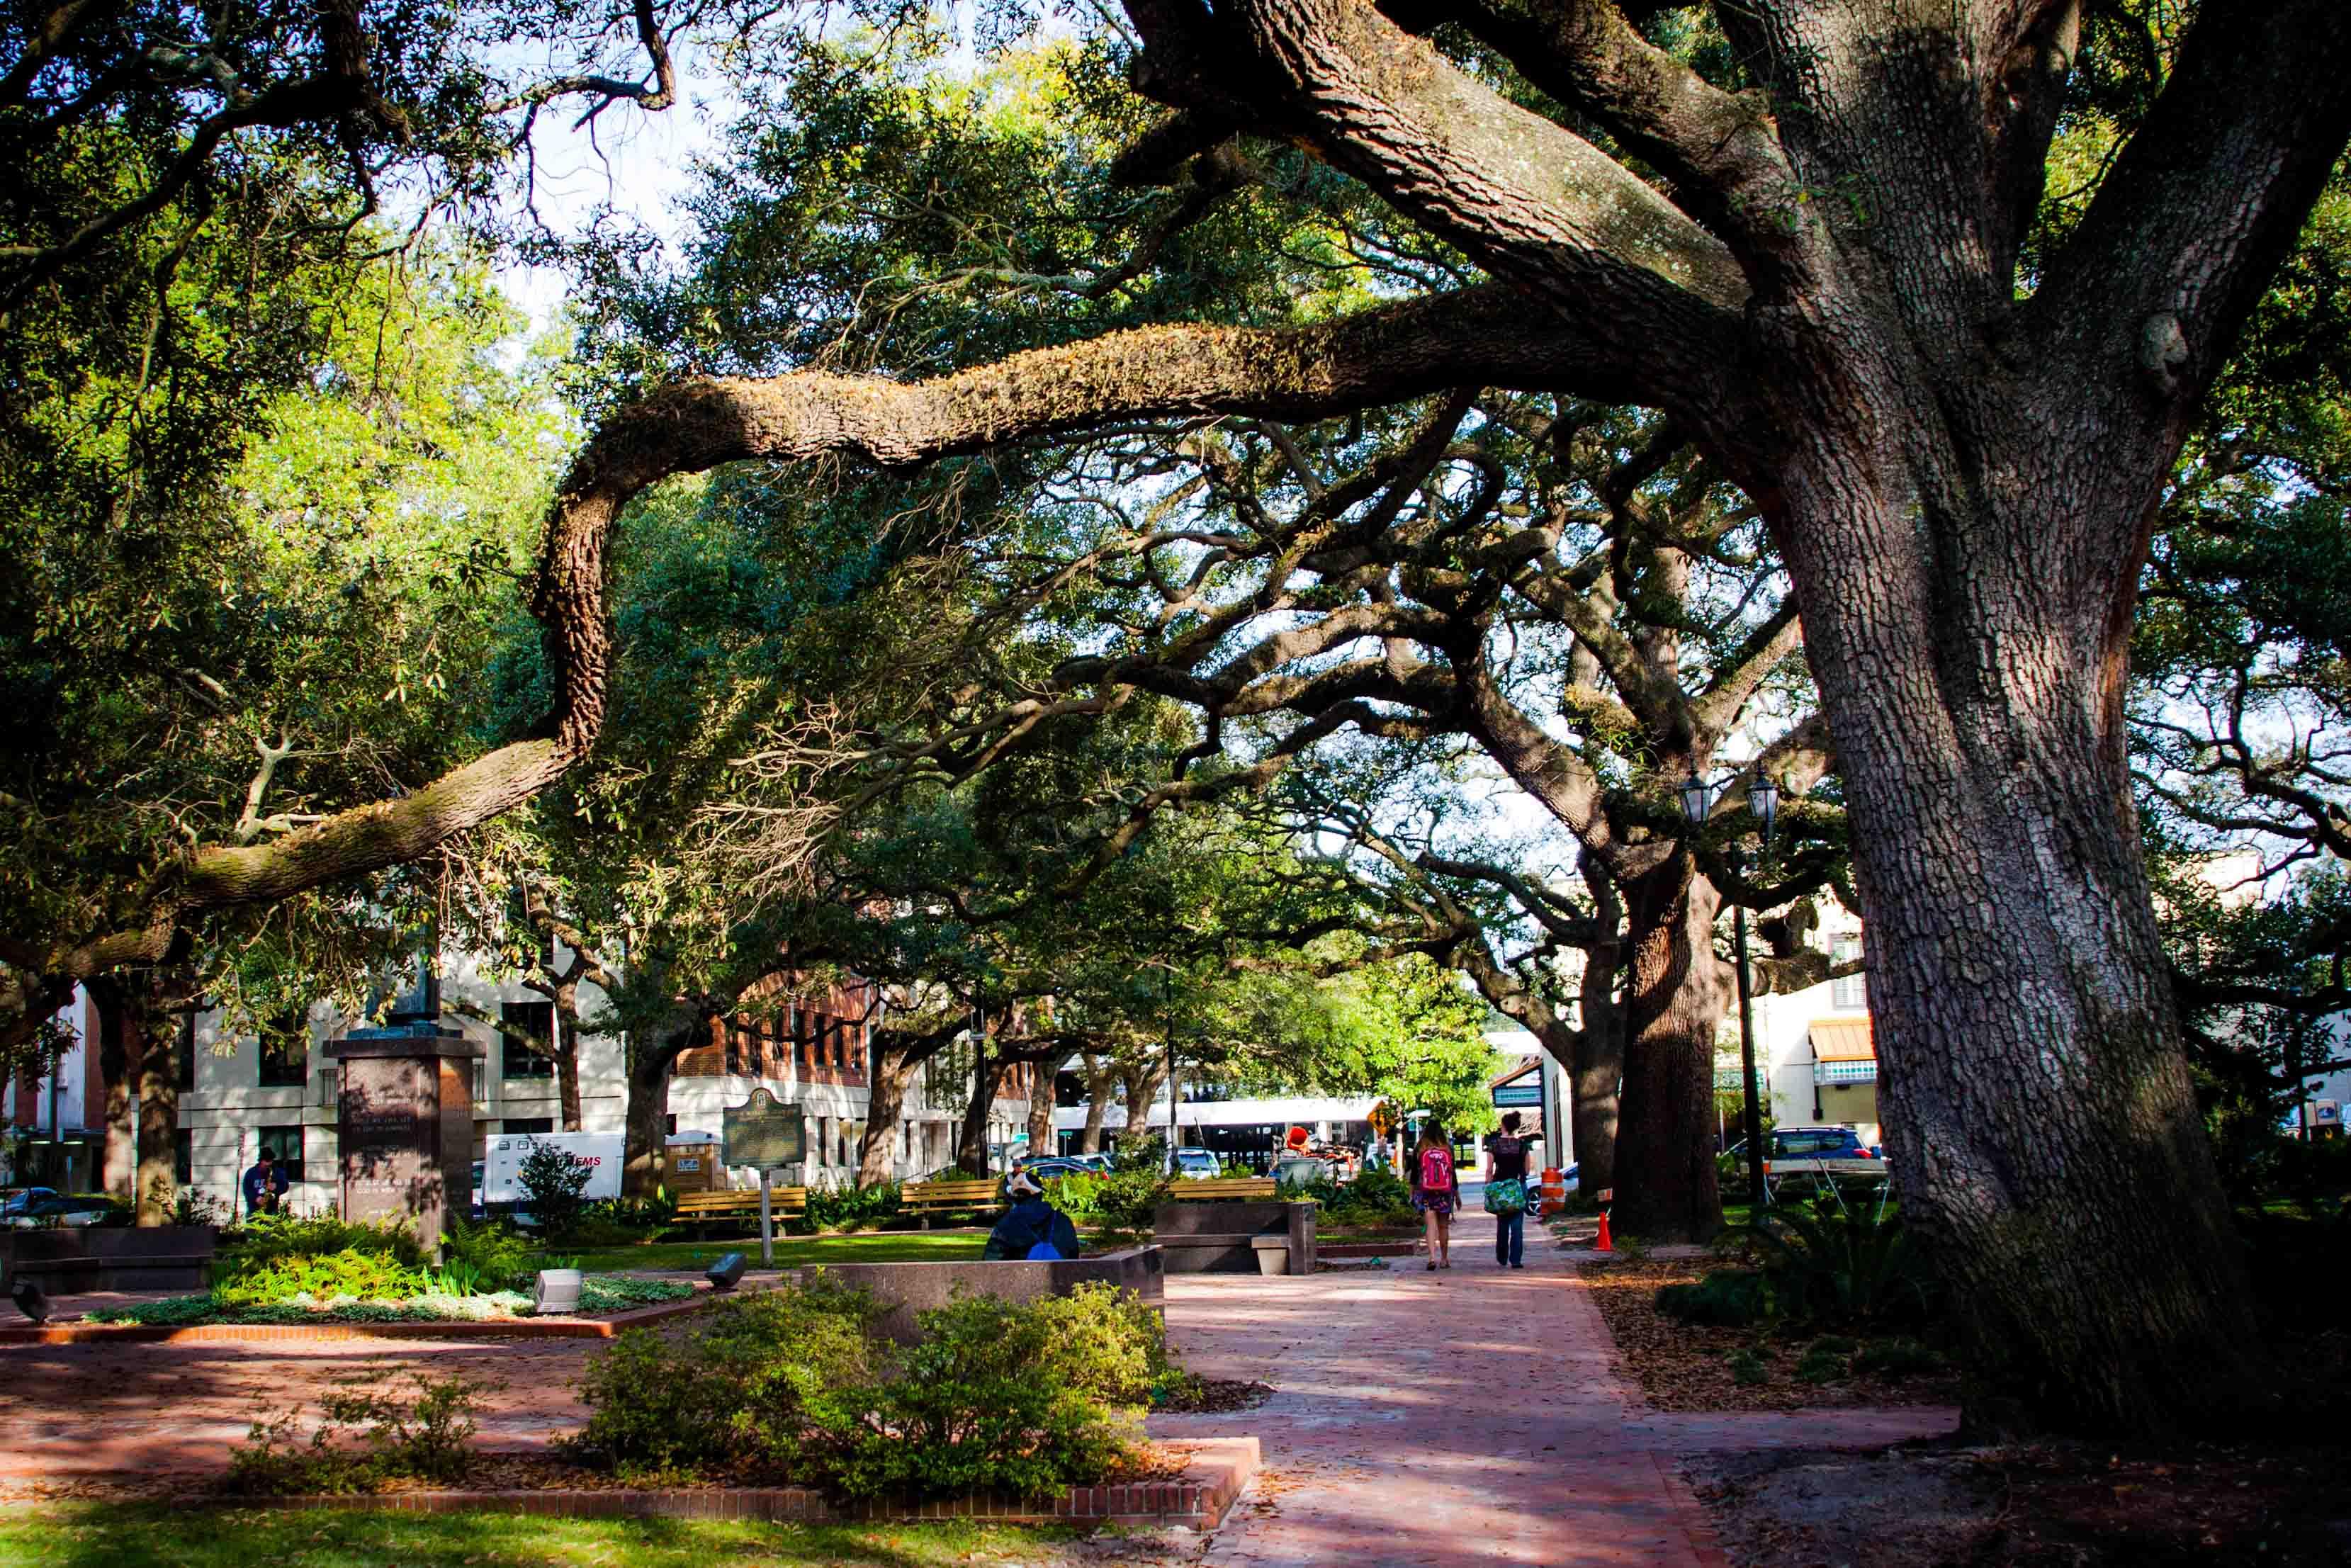 Savannah et ses arbres qui font rêver.